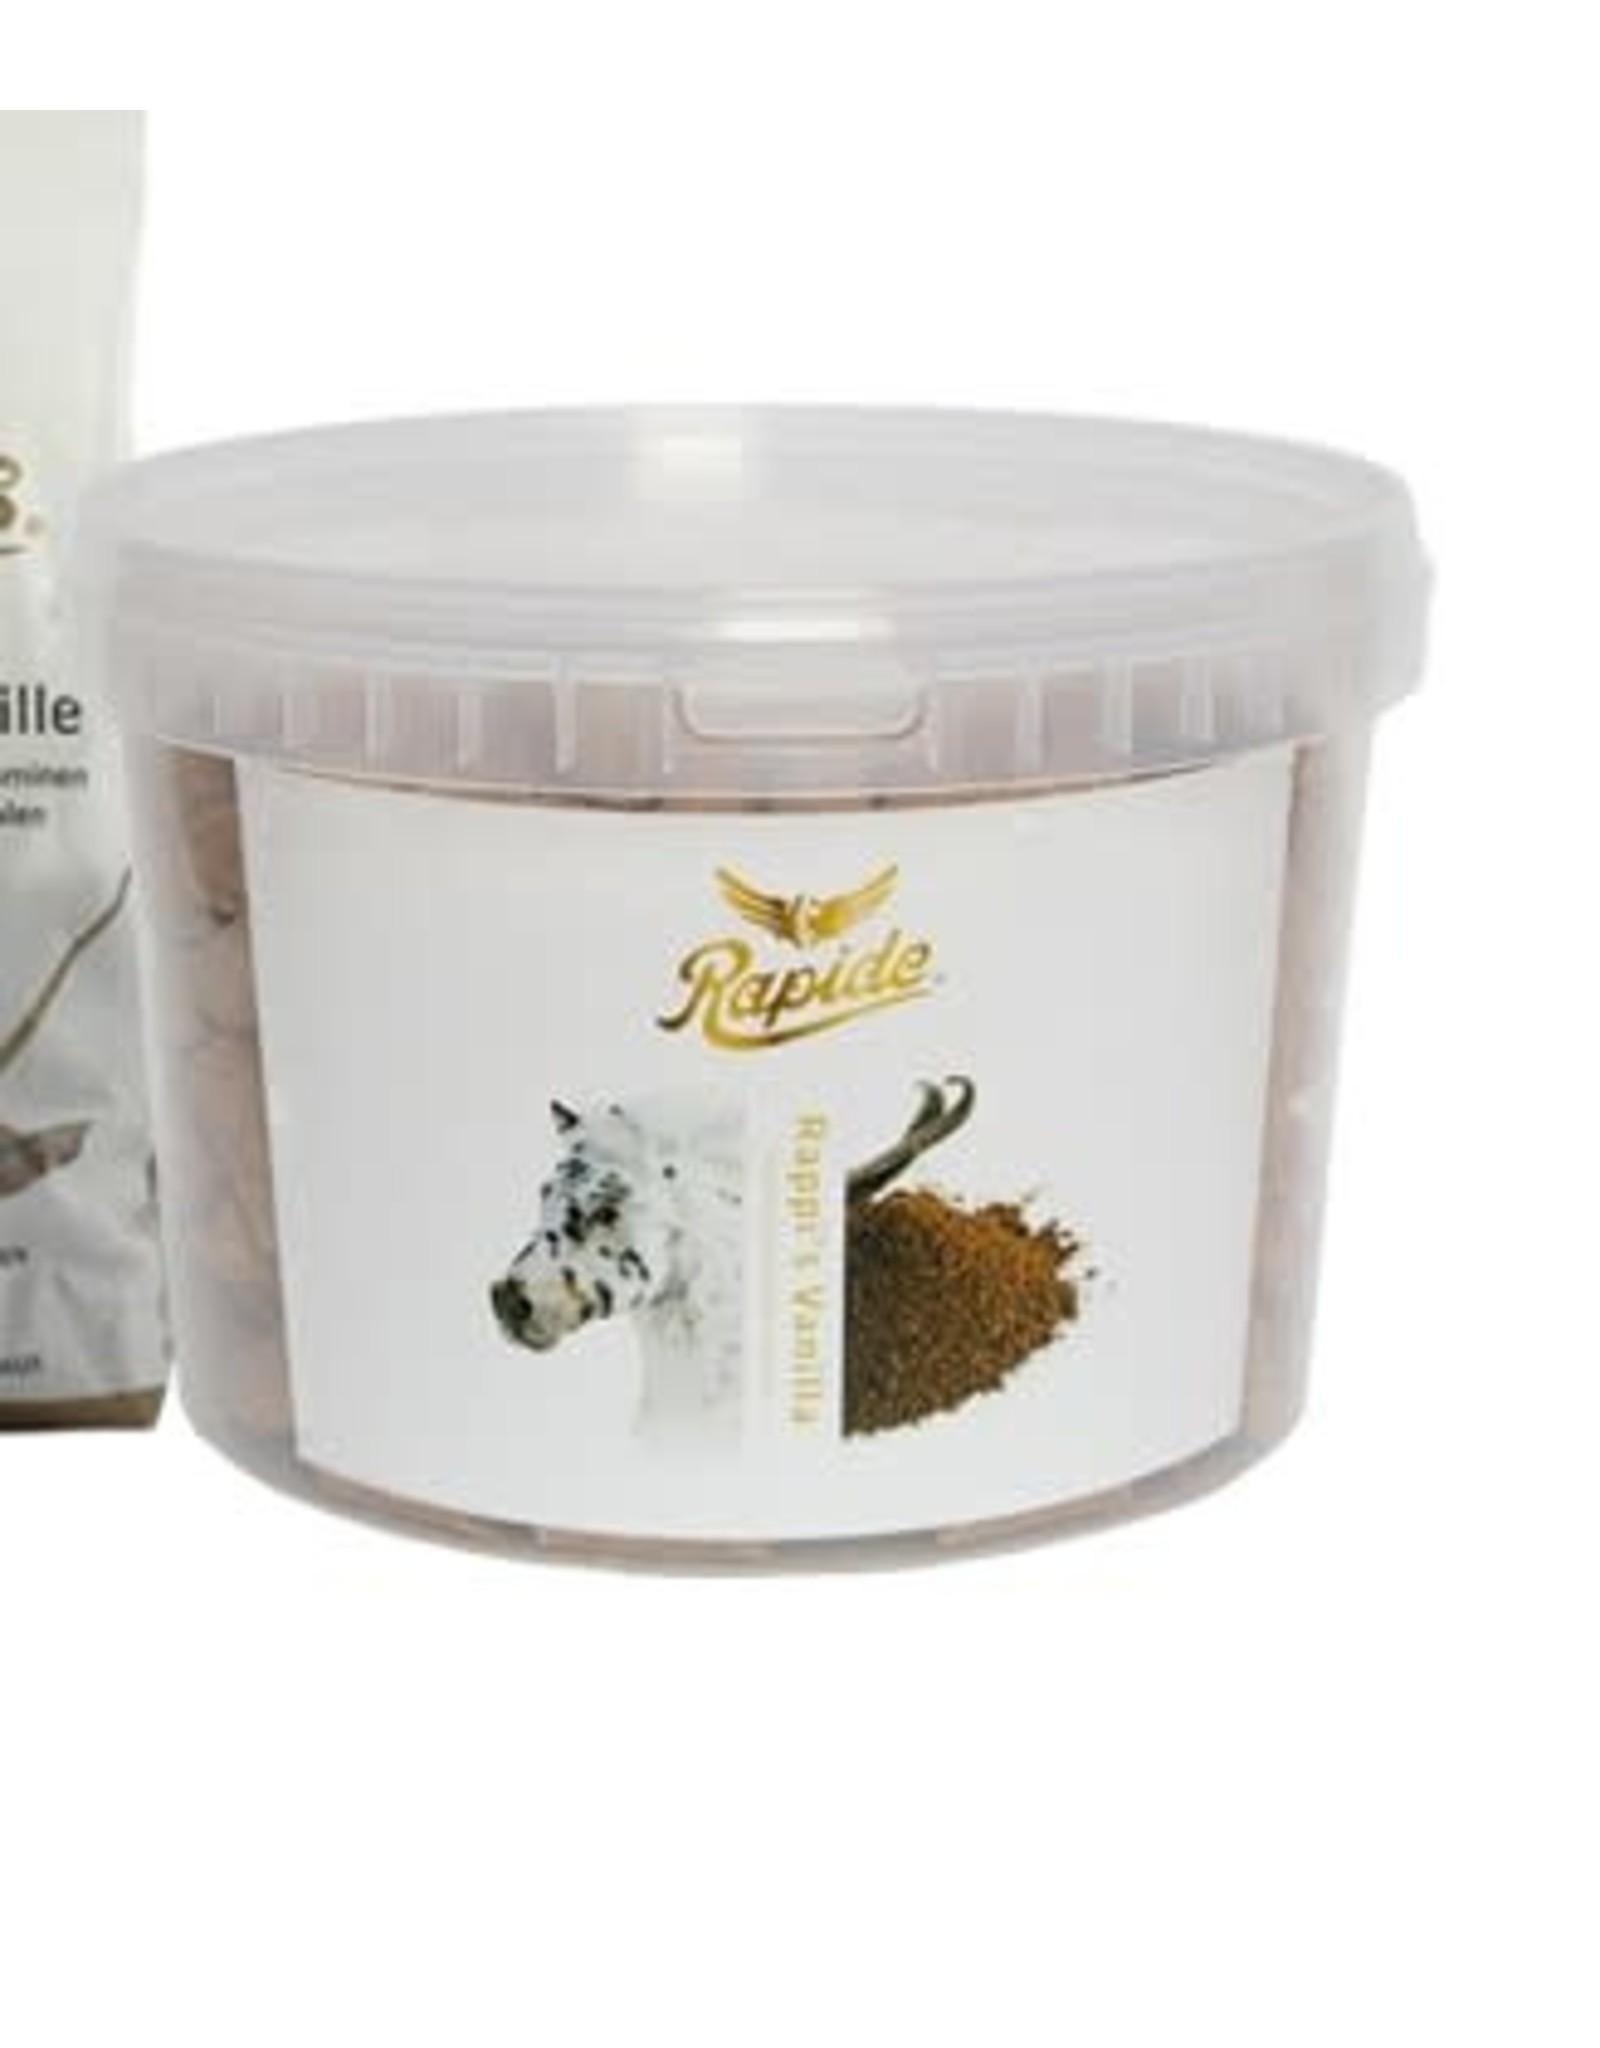 Rapide Rapide Rappi's vanille 2kg